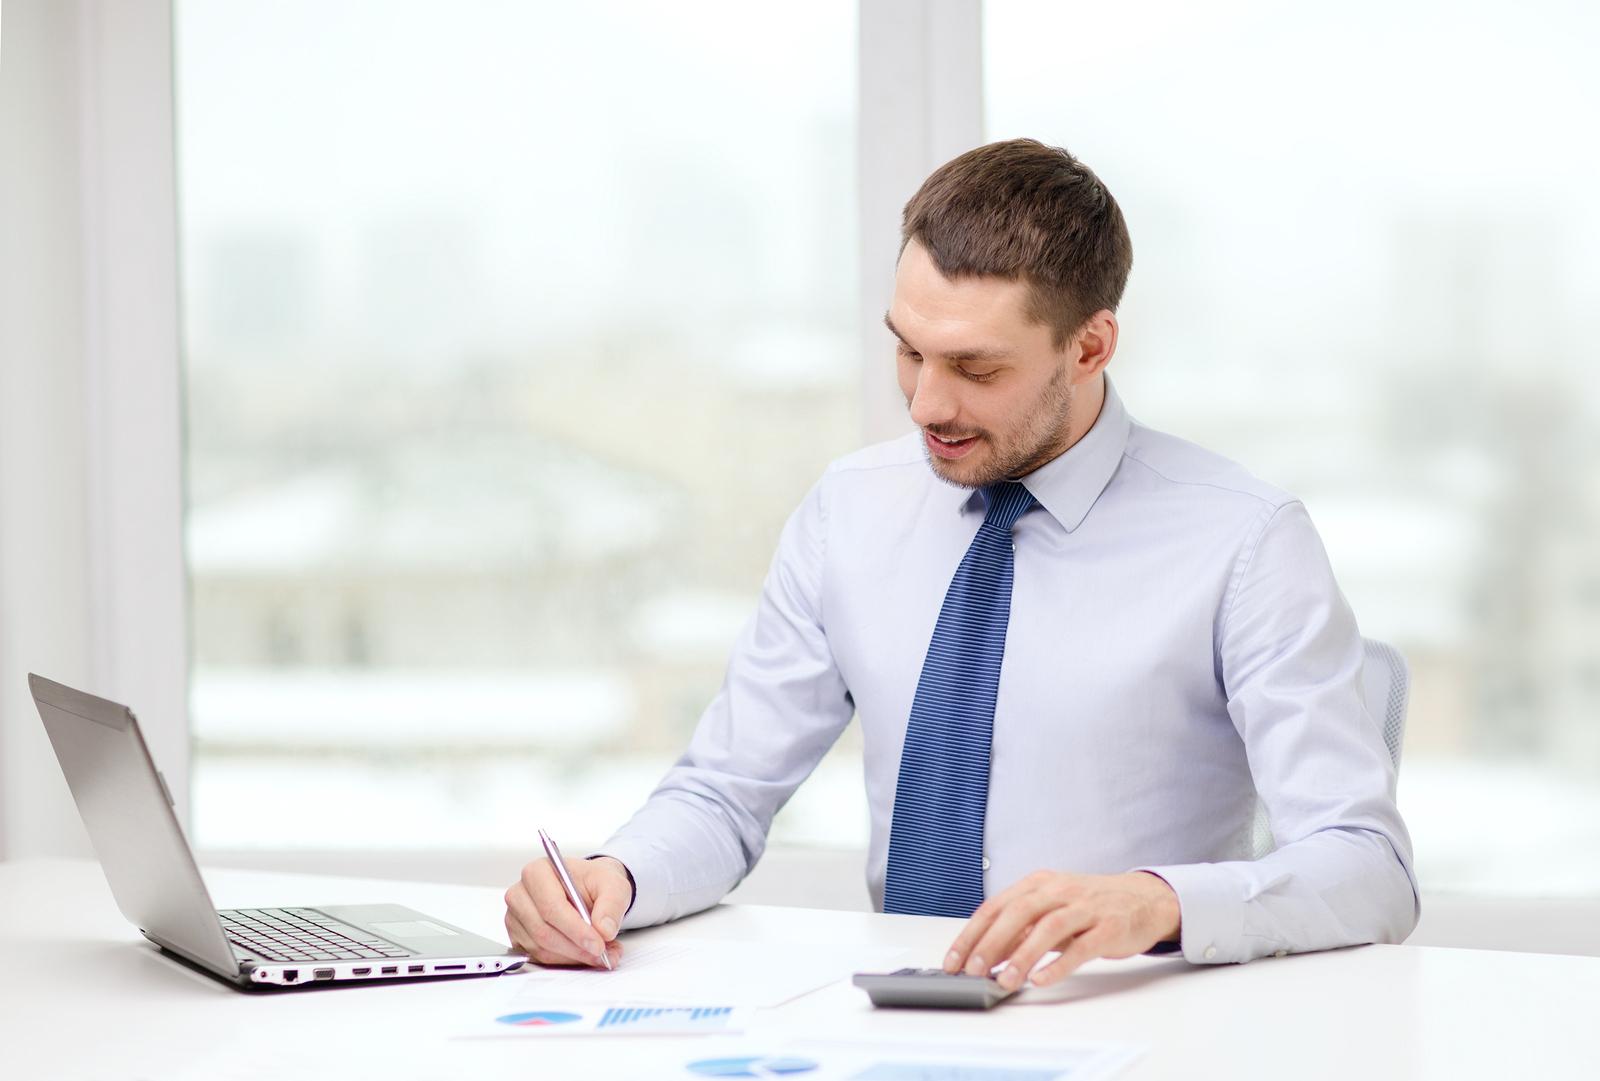 Man working while sitting at desk